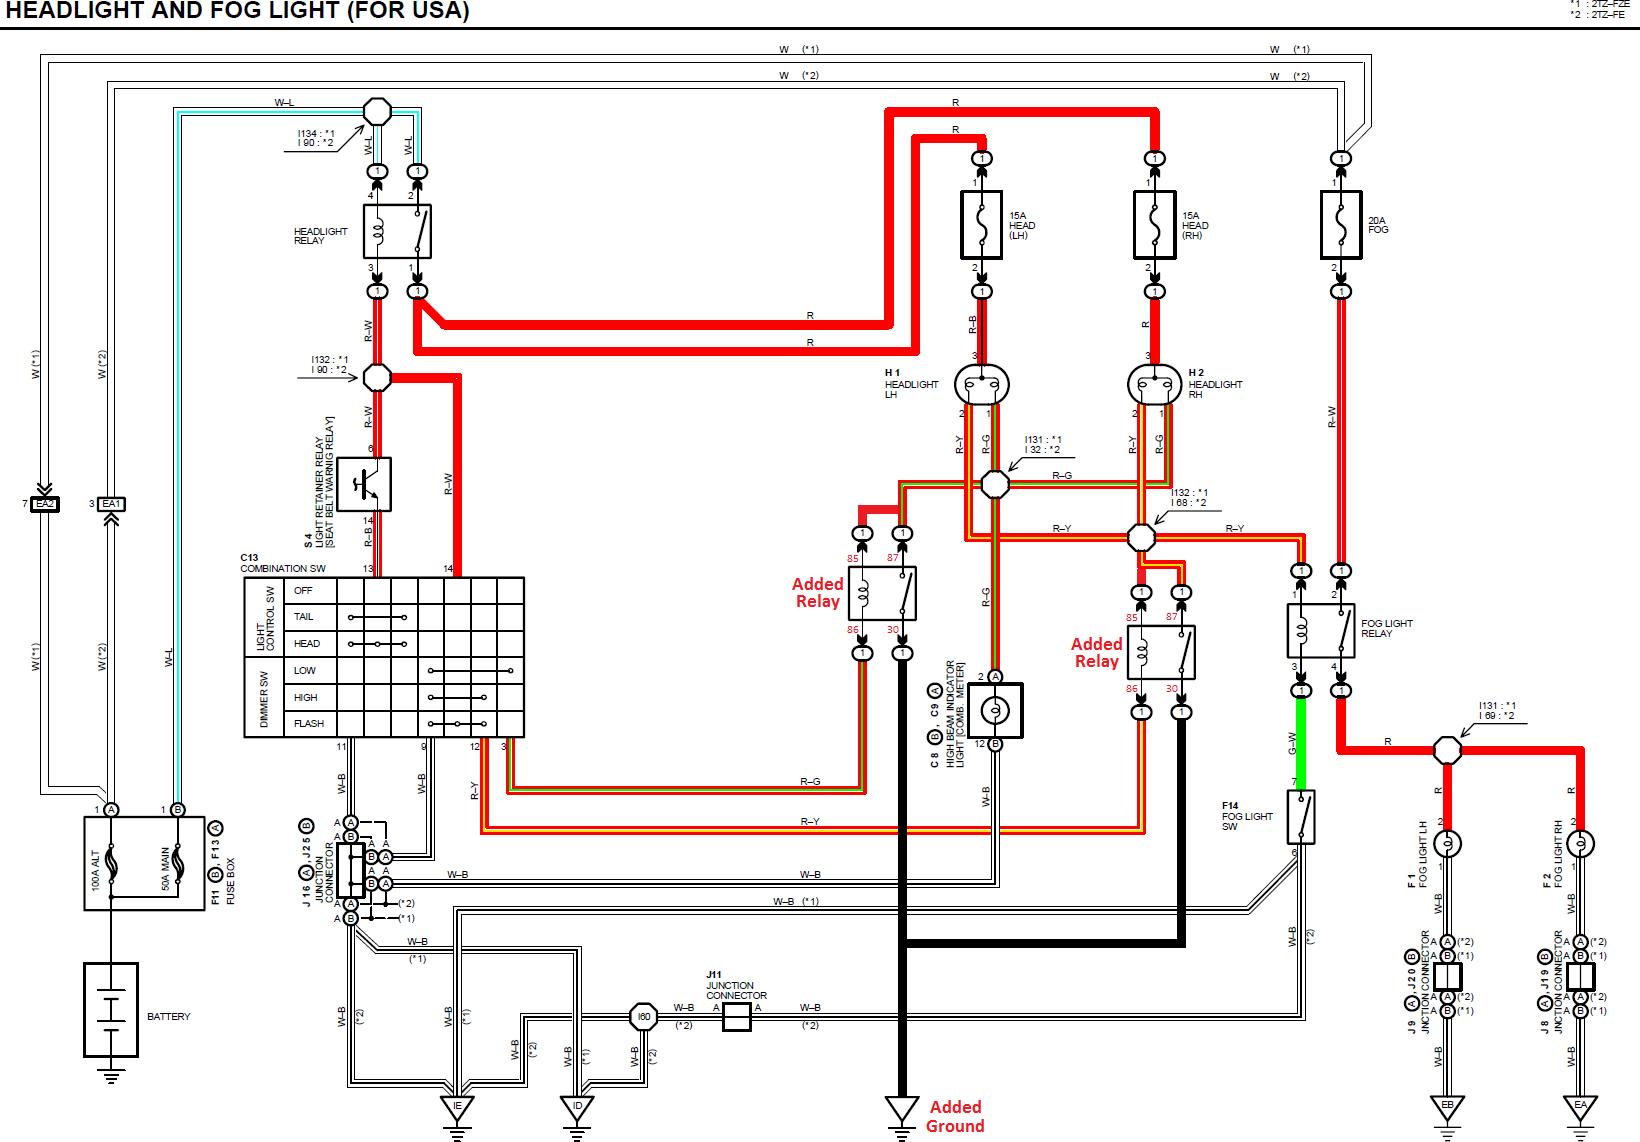 ek_7457] 10 switch box wiring diagram schematic wiring diagram headlight wiring diagram pdf headlight relay wiring diagram brece knie ophag apan kicep mohammedshrine librar wiring 101